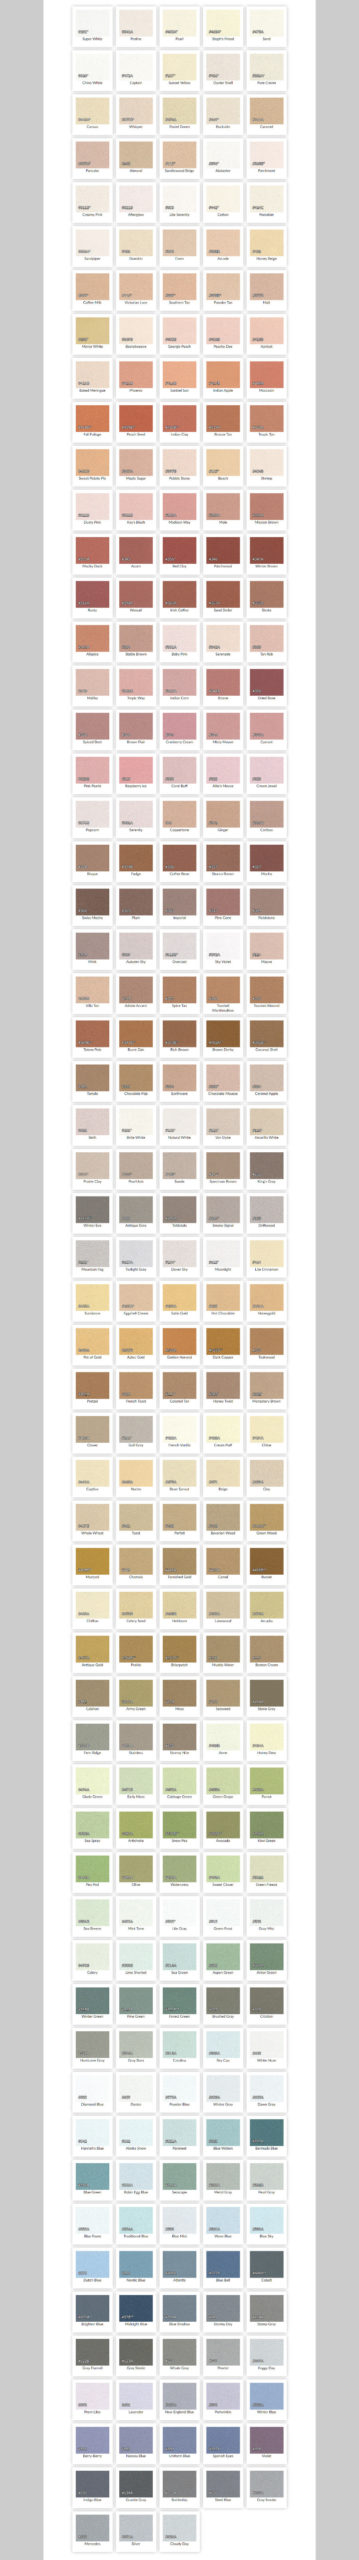 Dryvit Standard Colors